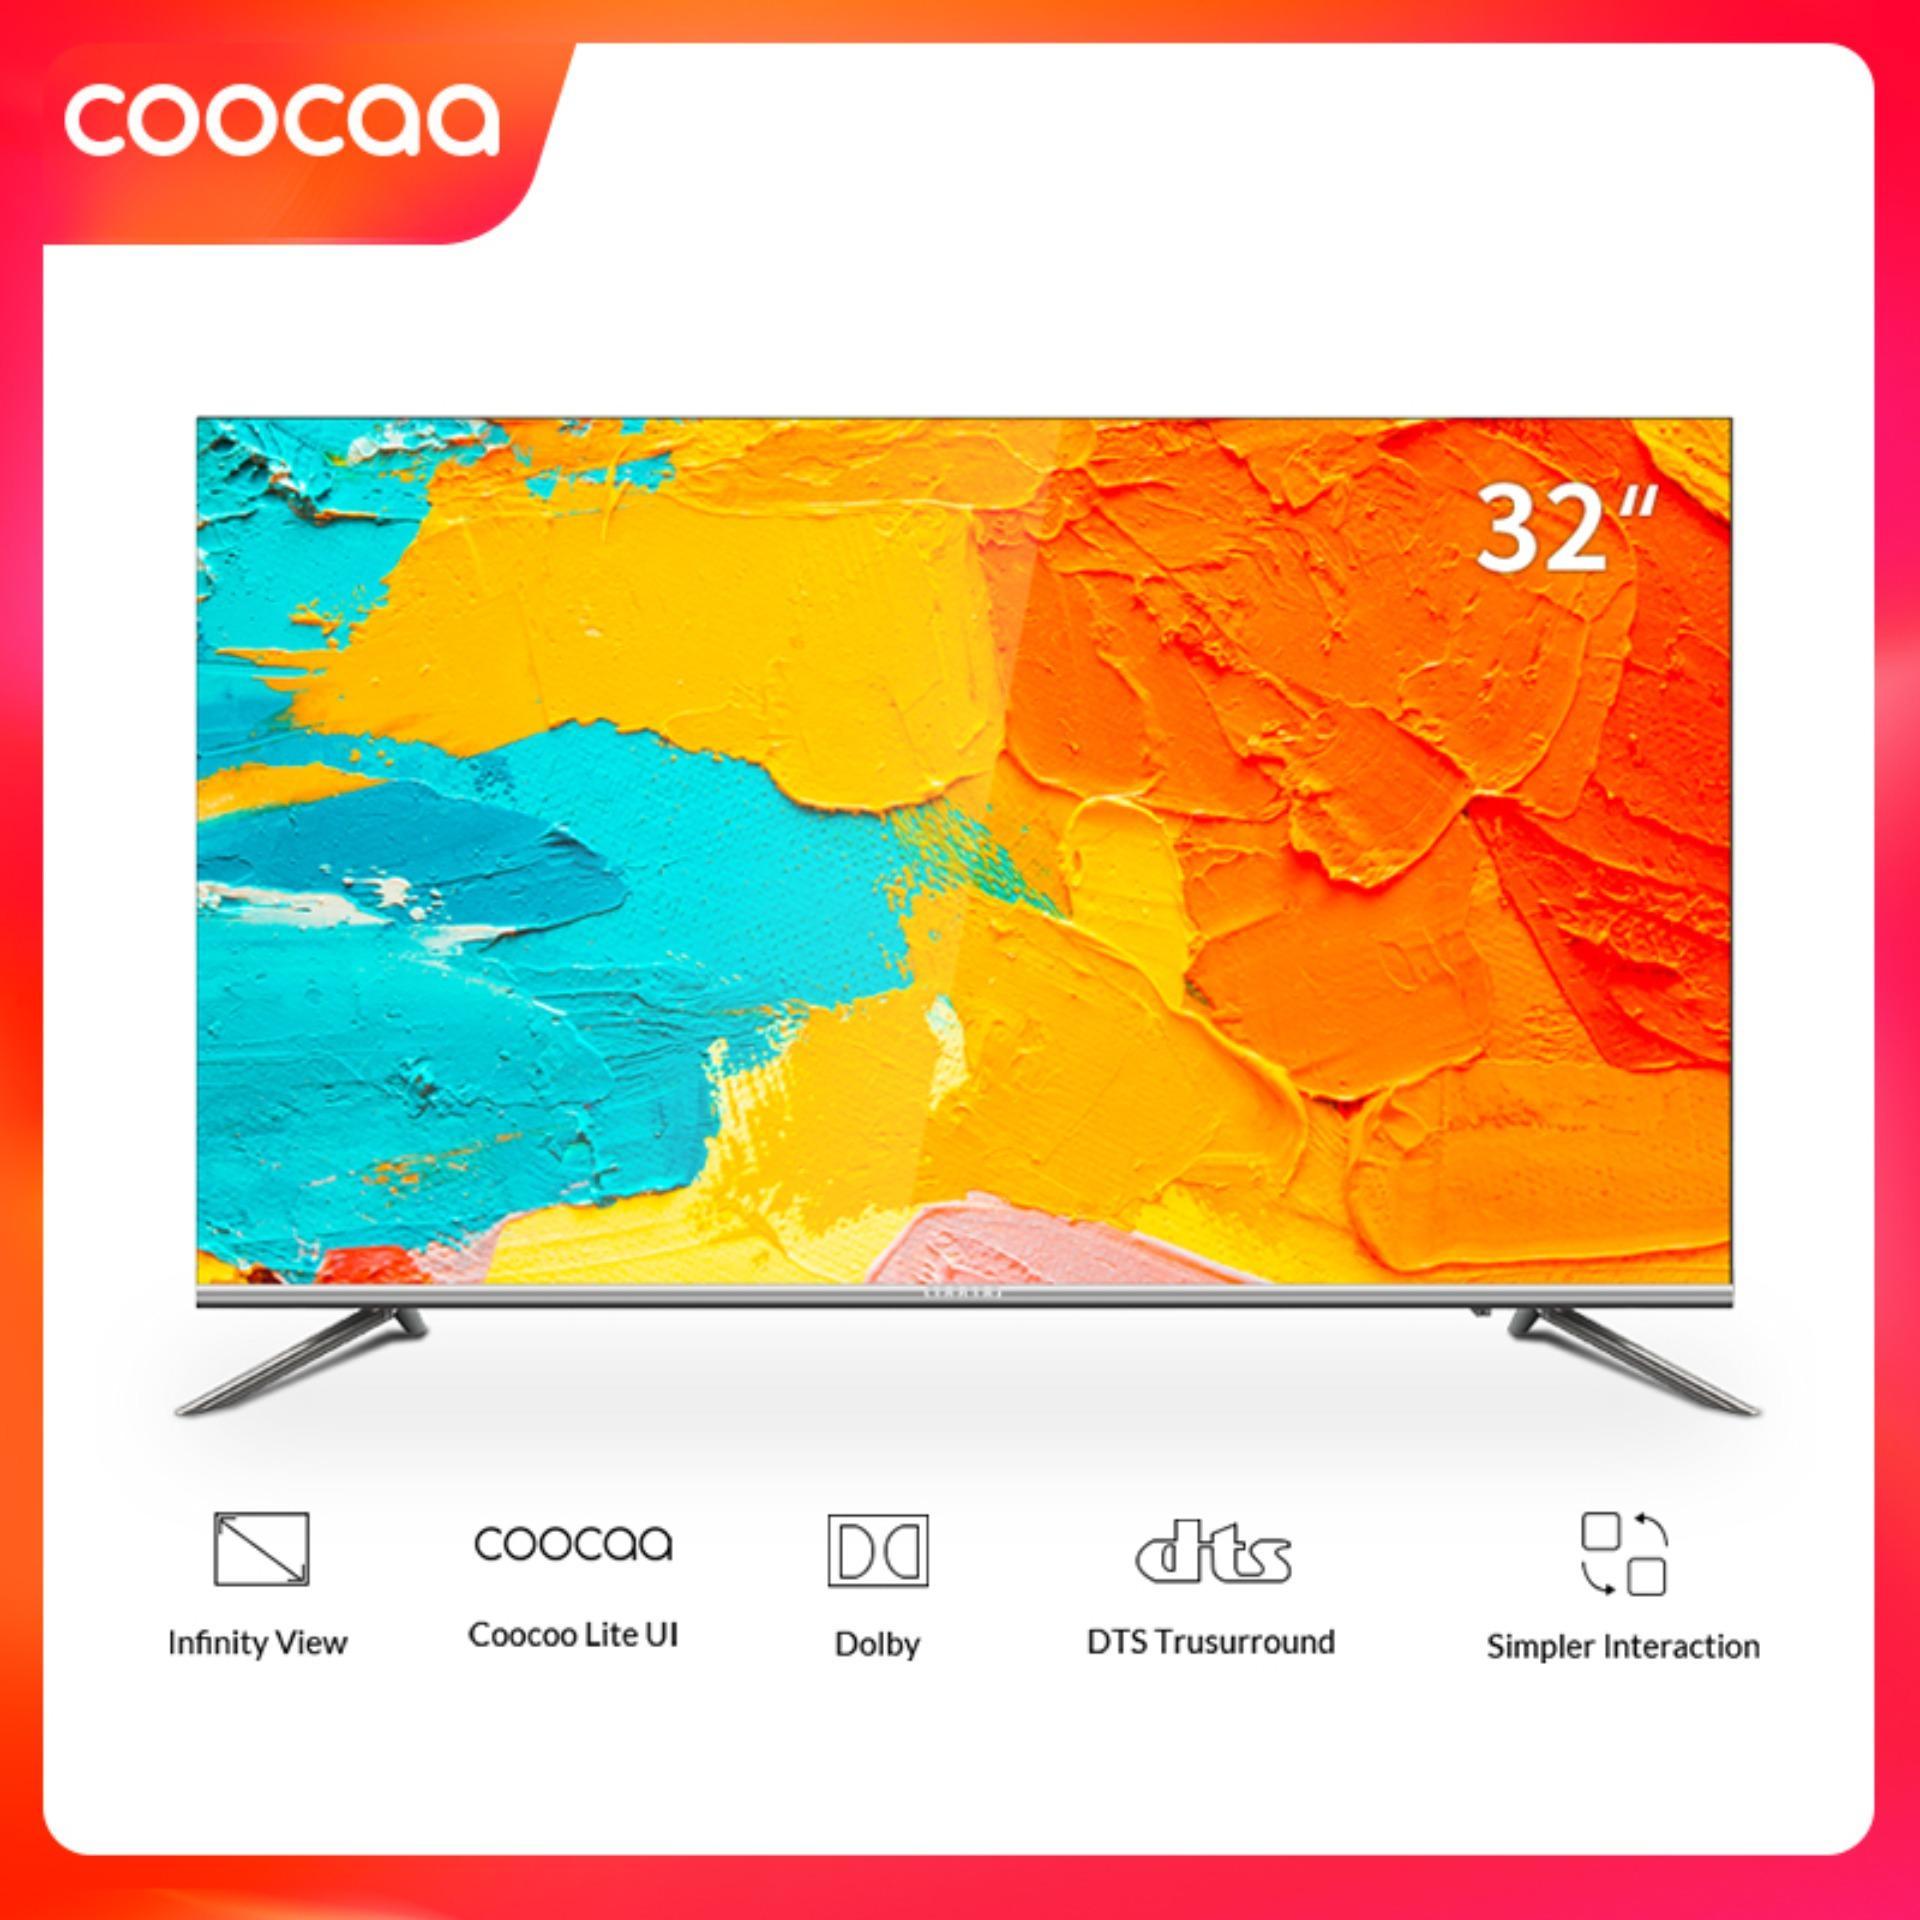 Smart TV HD Coocaa 32 inch Wifi - Tràn viền - Model 32S5C (Bạc) - Chân viền kim loại